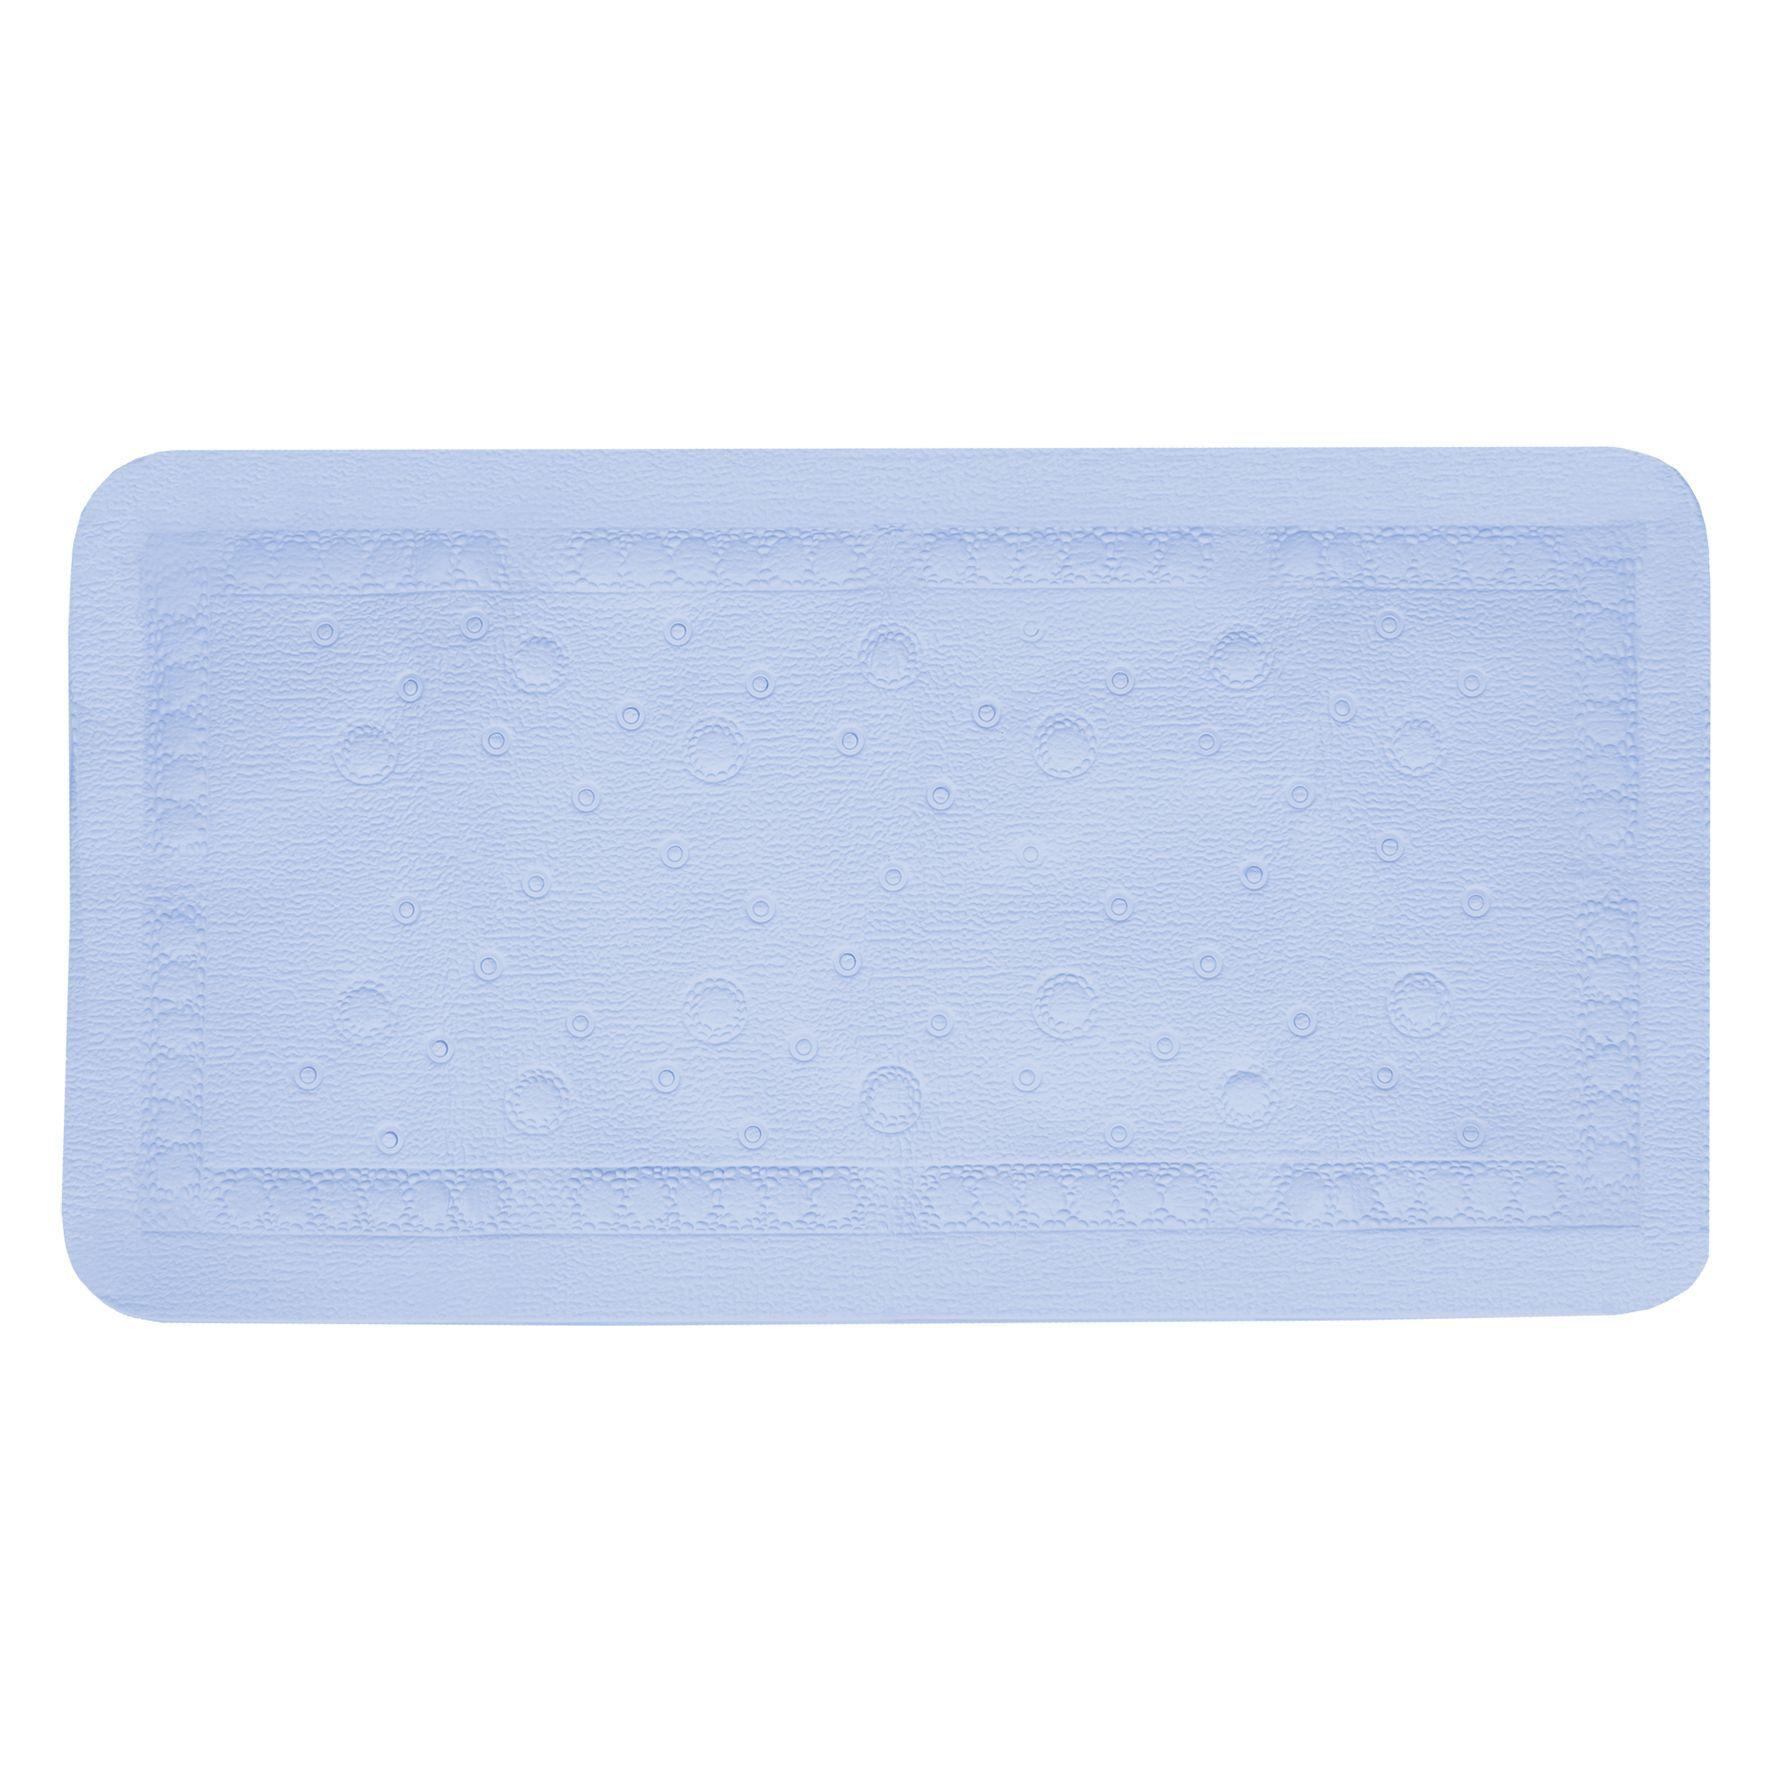 Differnz Tutus antislip badmat 68x36cm blauw